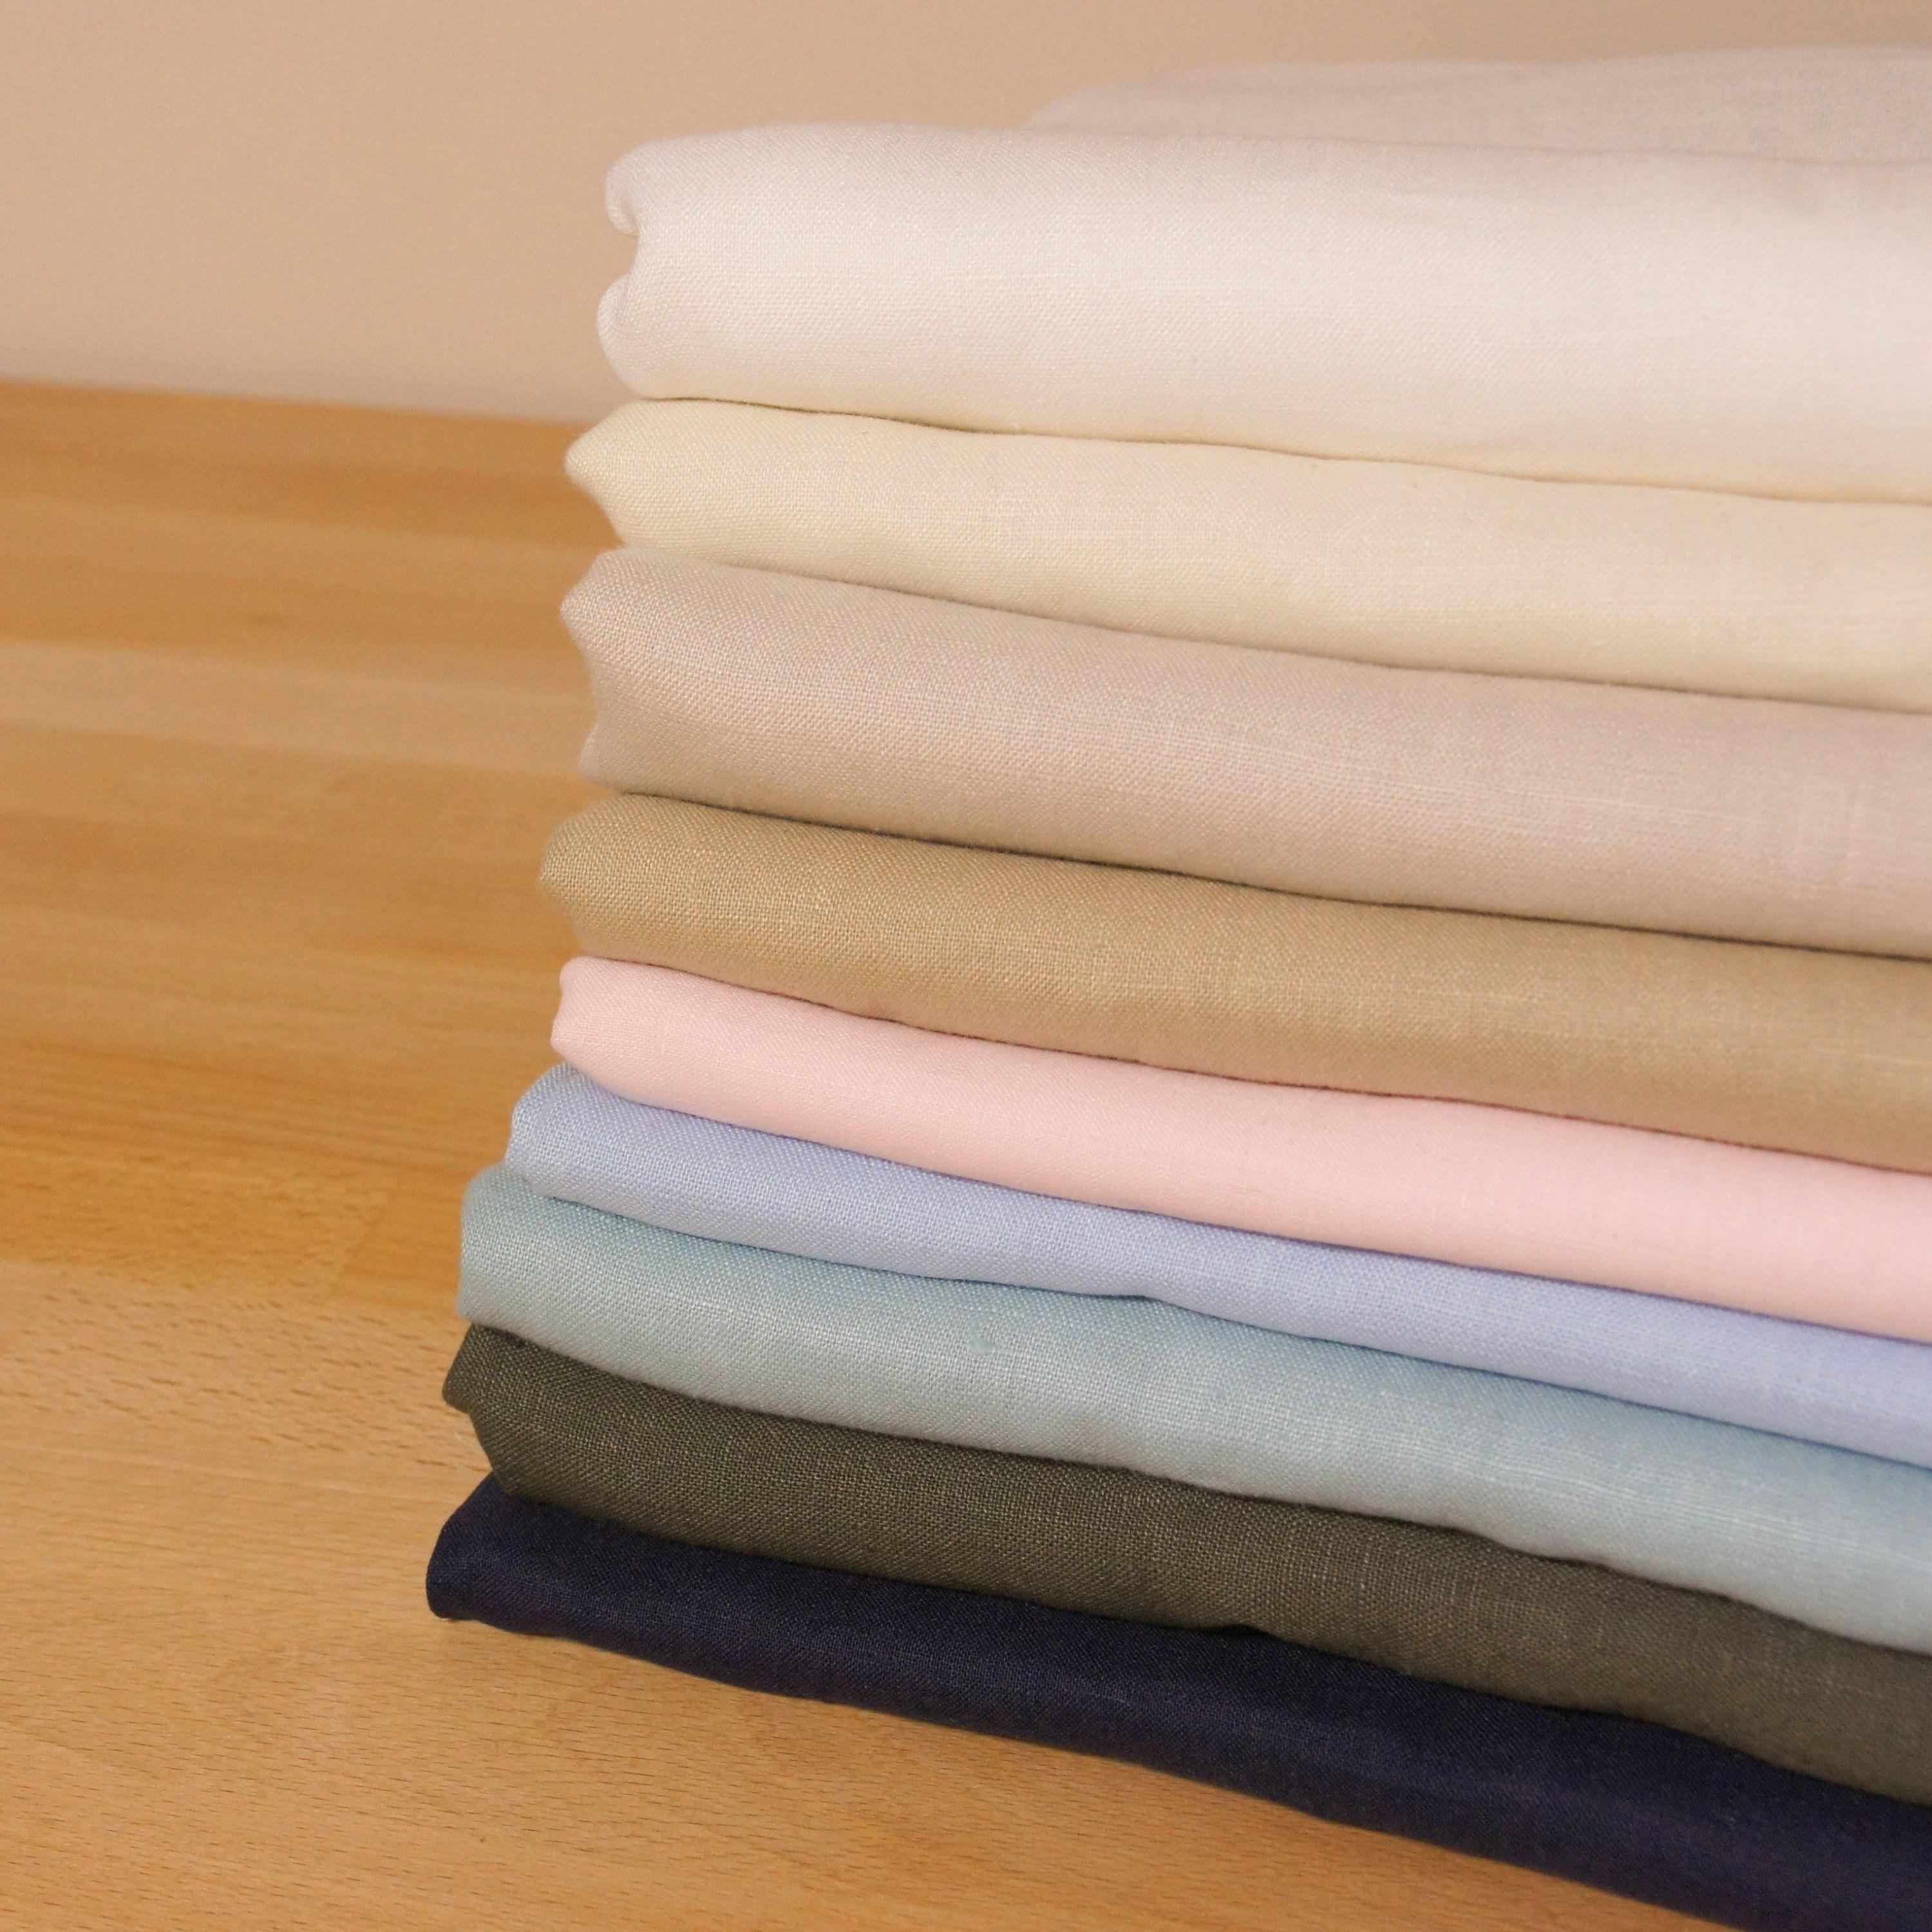 Pure Linen Fabric By 1 2 Metre 100 Linen Fabric Natural Linen Fabric Blue Linen Fabric Pink Linen Medium Weight Linen Apparel Fabric Luxury Fabrics Fabric Dressmaking